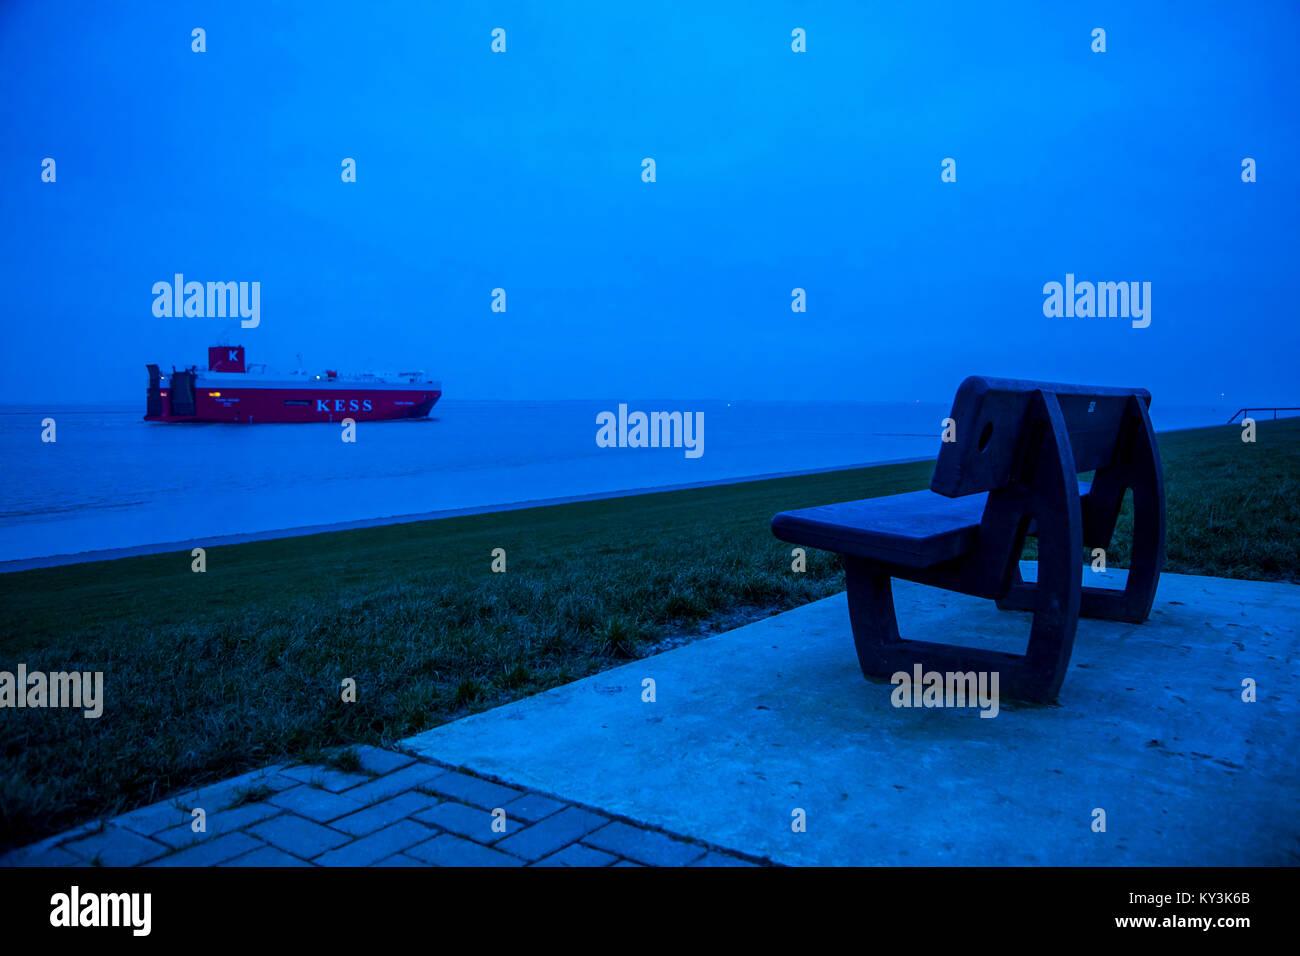 "Auto Transporter Schiff, die ""K"" Line European Sea Highway Services (KESS) auf den Dollart, Ems Estuary, Stockbild"